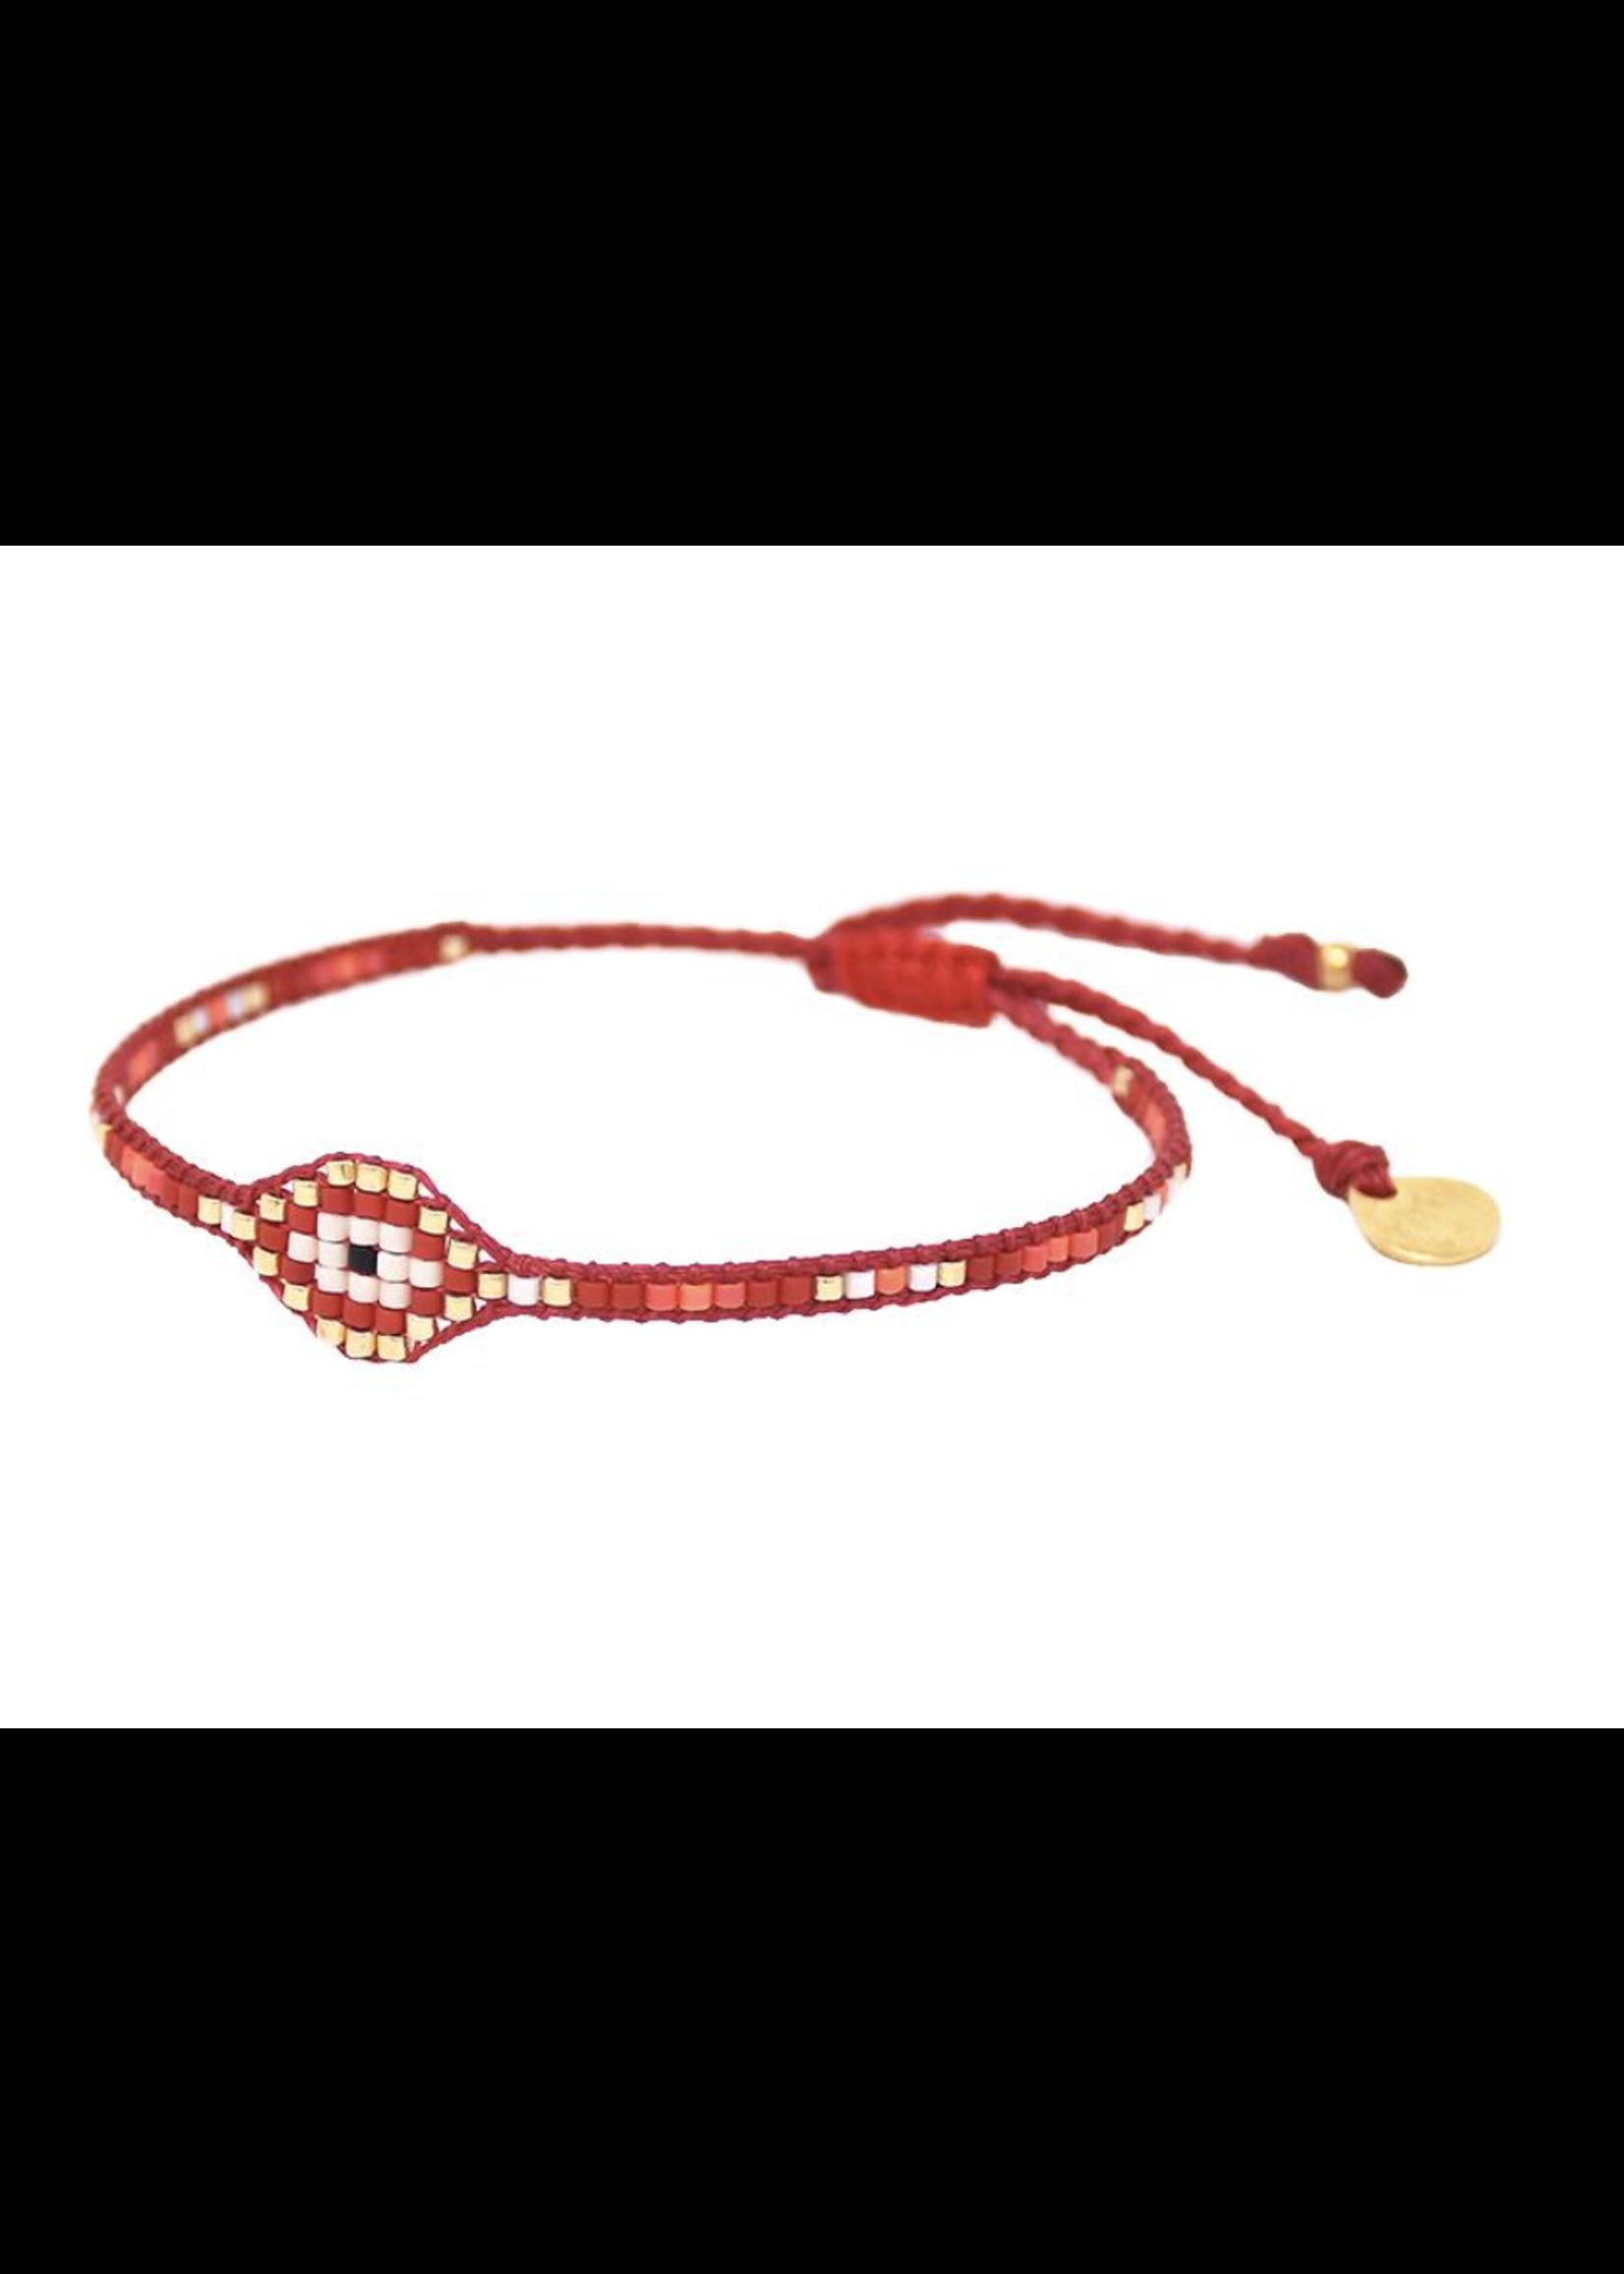 Mishky Red & Gold Evil Eye Row 2.0 Bracelet